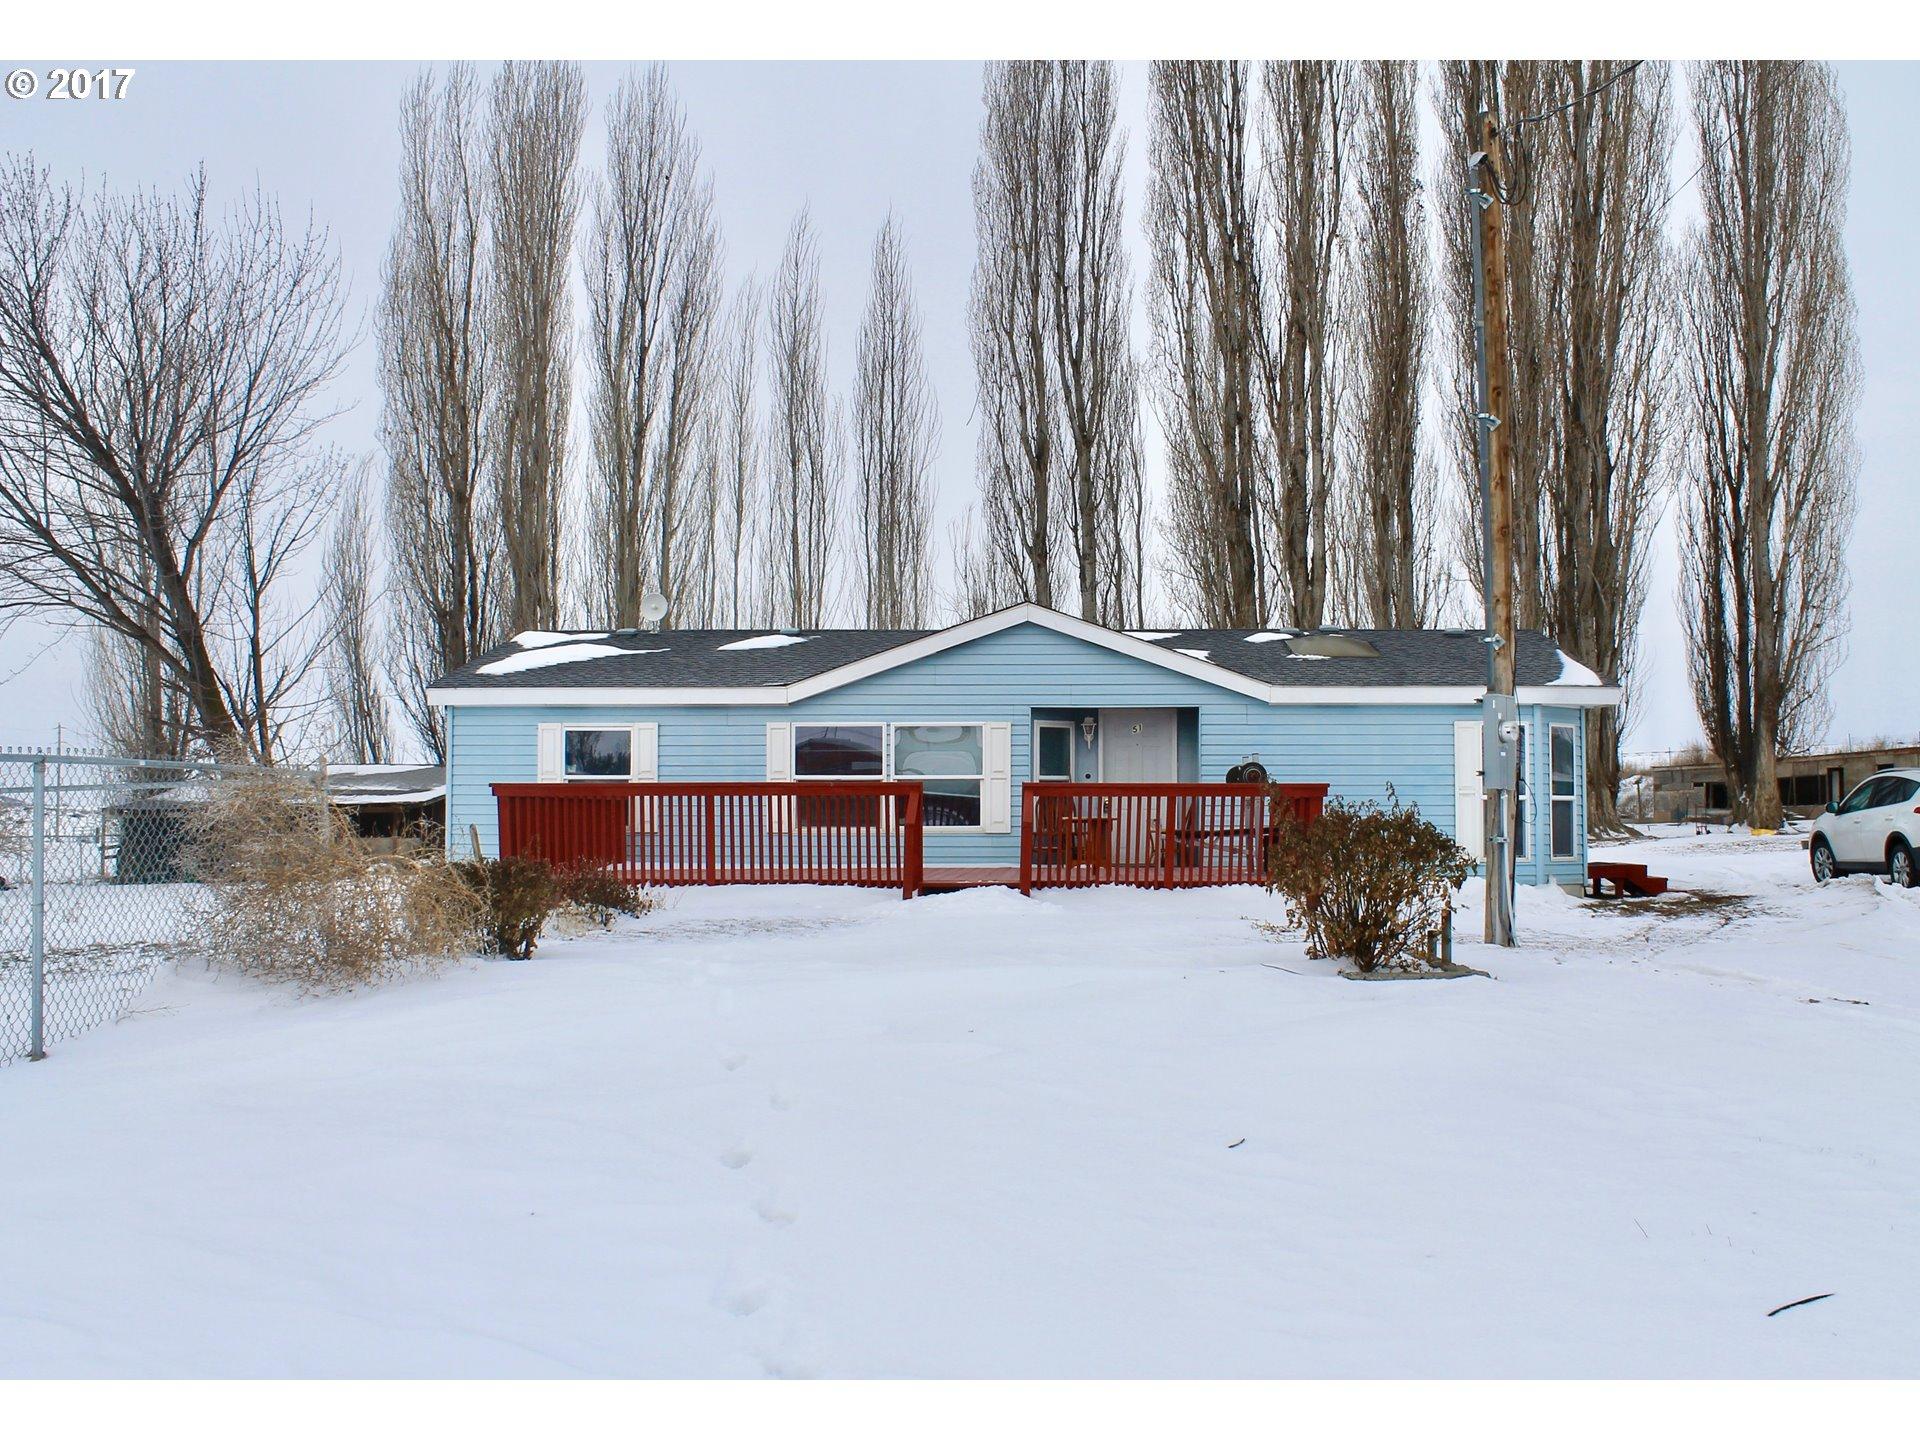 51 N Metcalf RD, Pasco, WA 99301